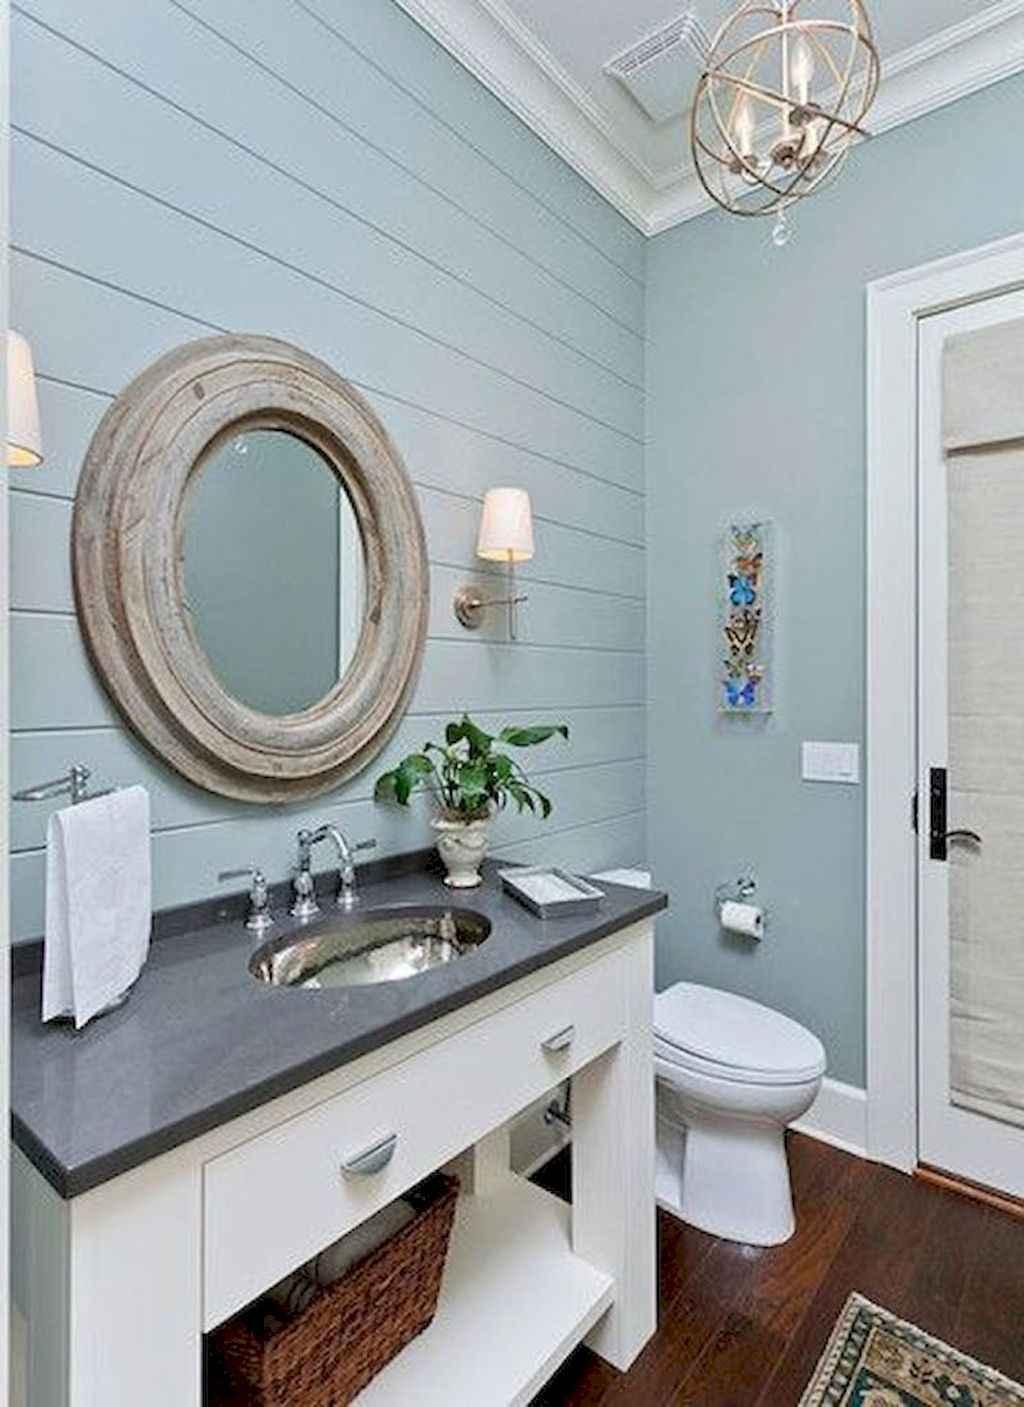 125 awesome farmhouse bathroom vanity remodel ideas (67)